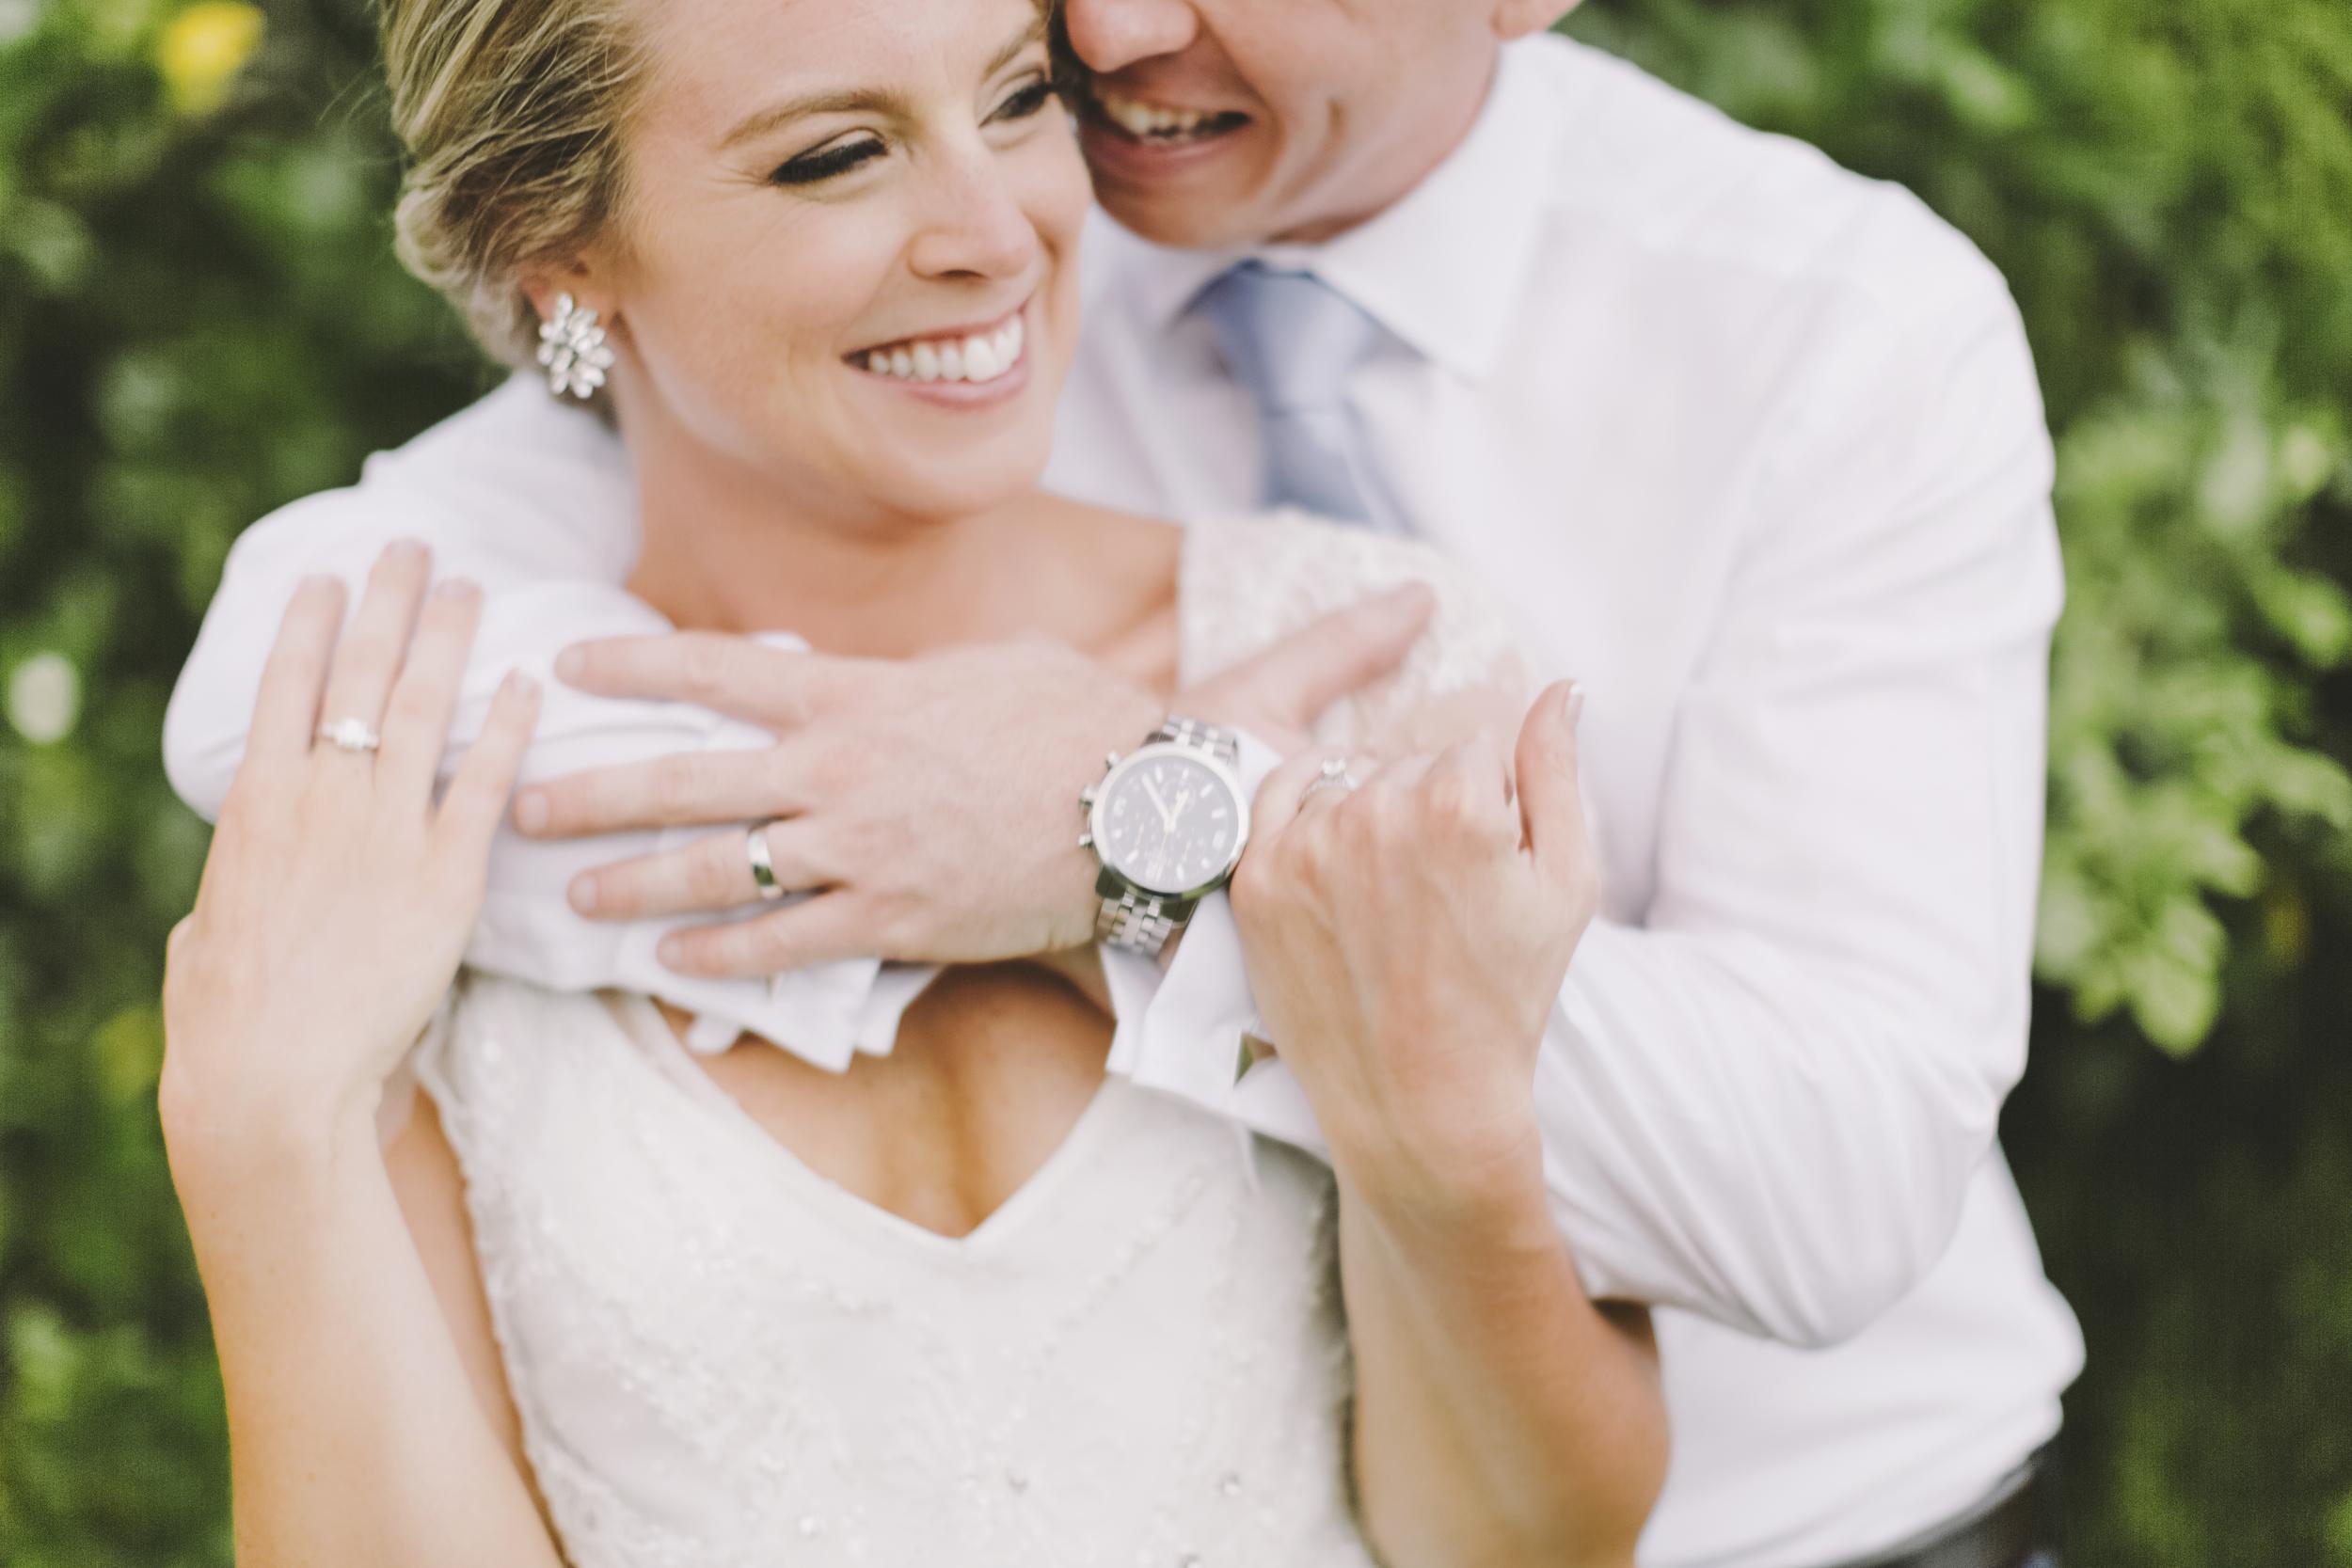 angie-diaz-photography-maui-wedding-mel-matt-95.jpg